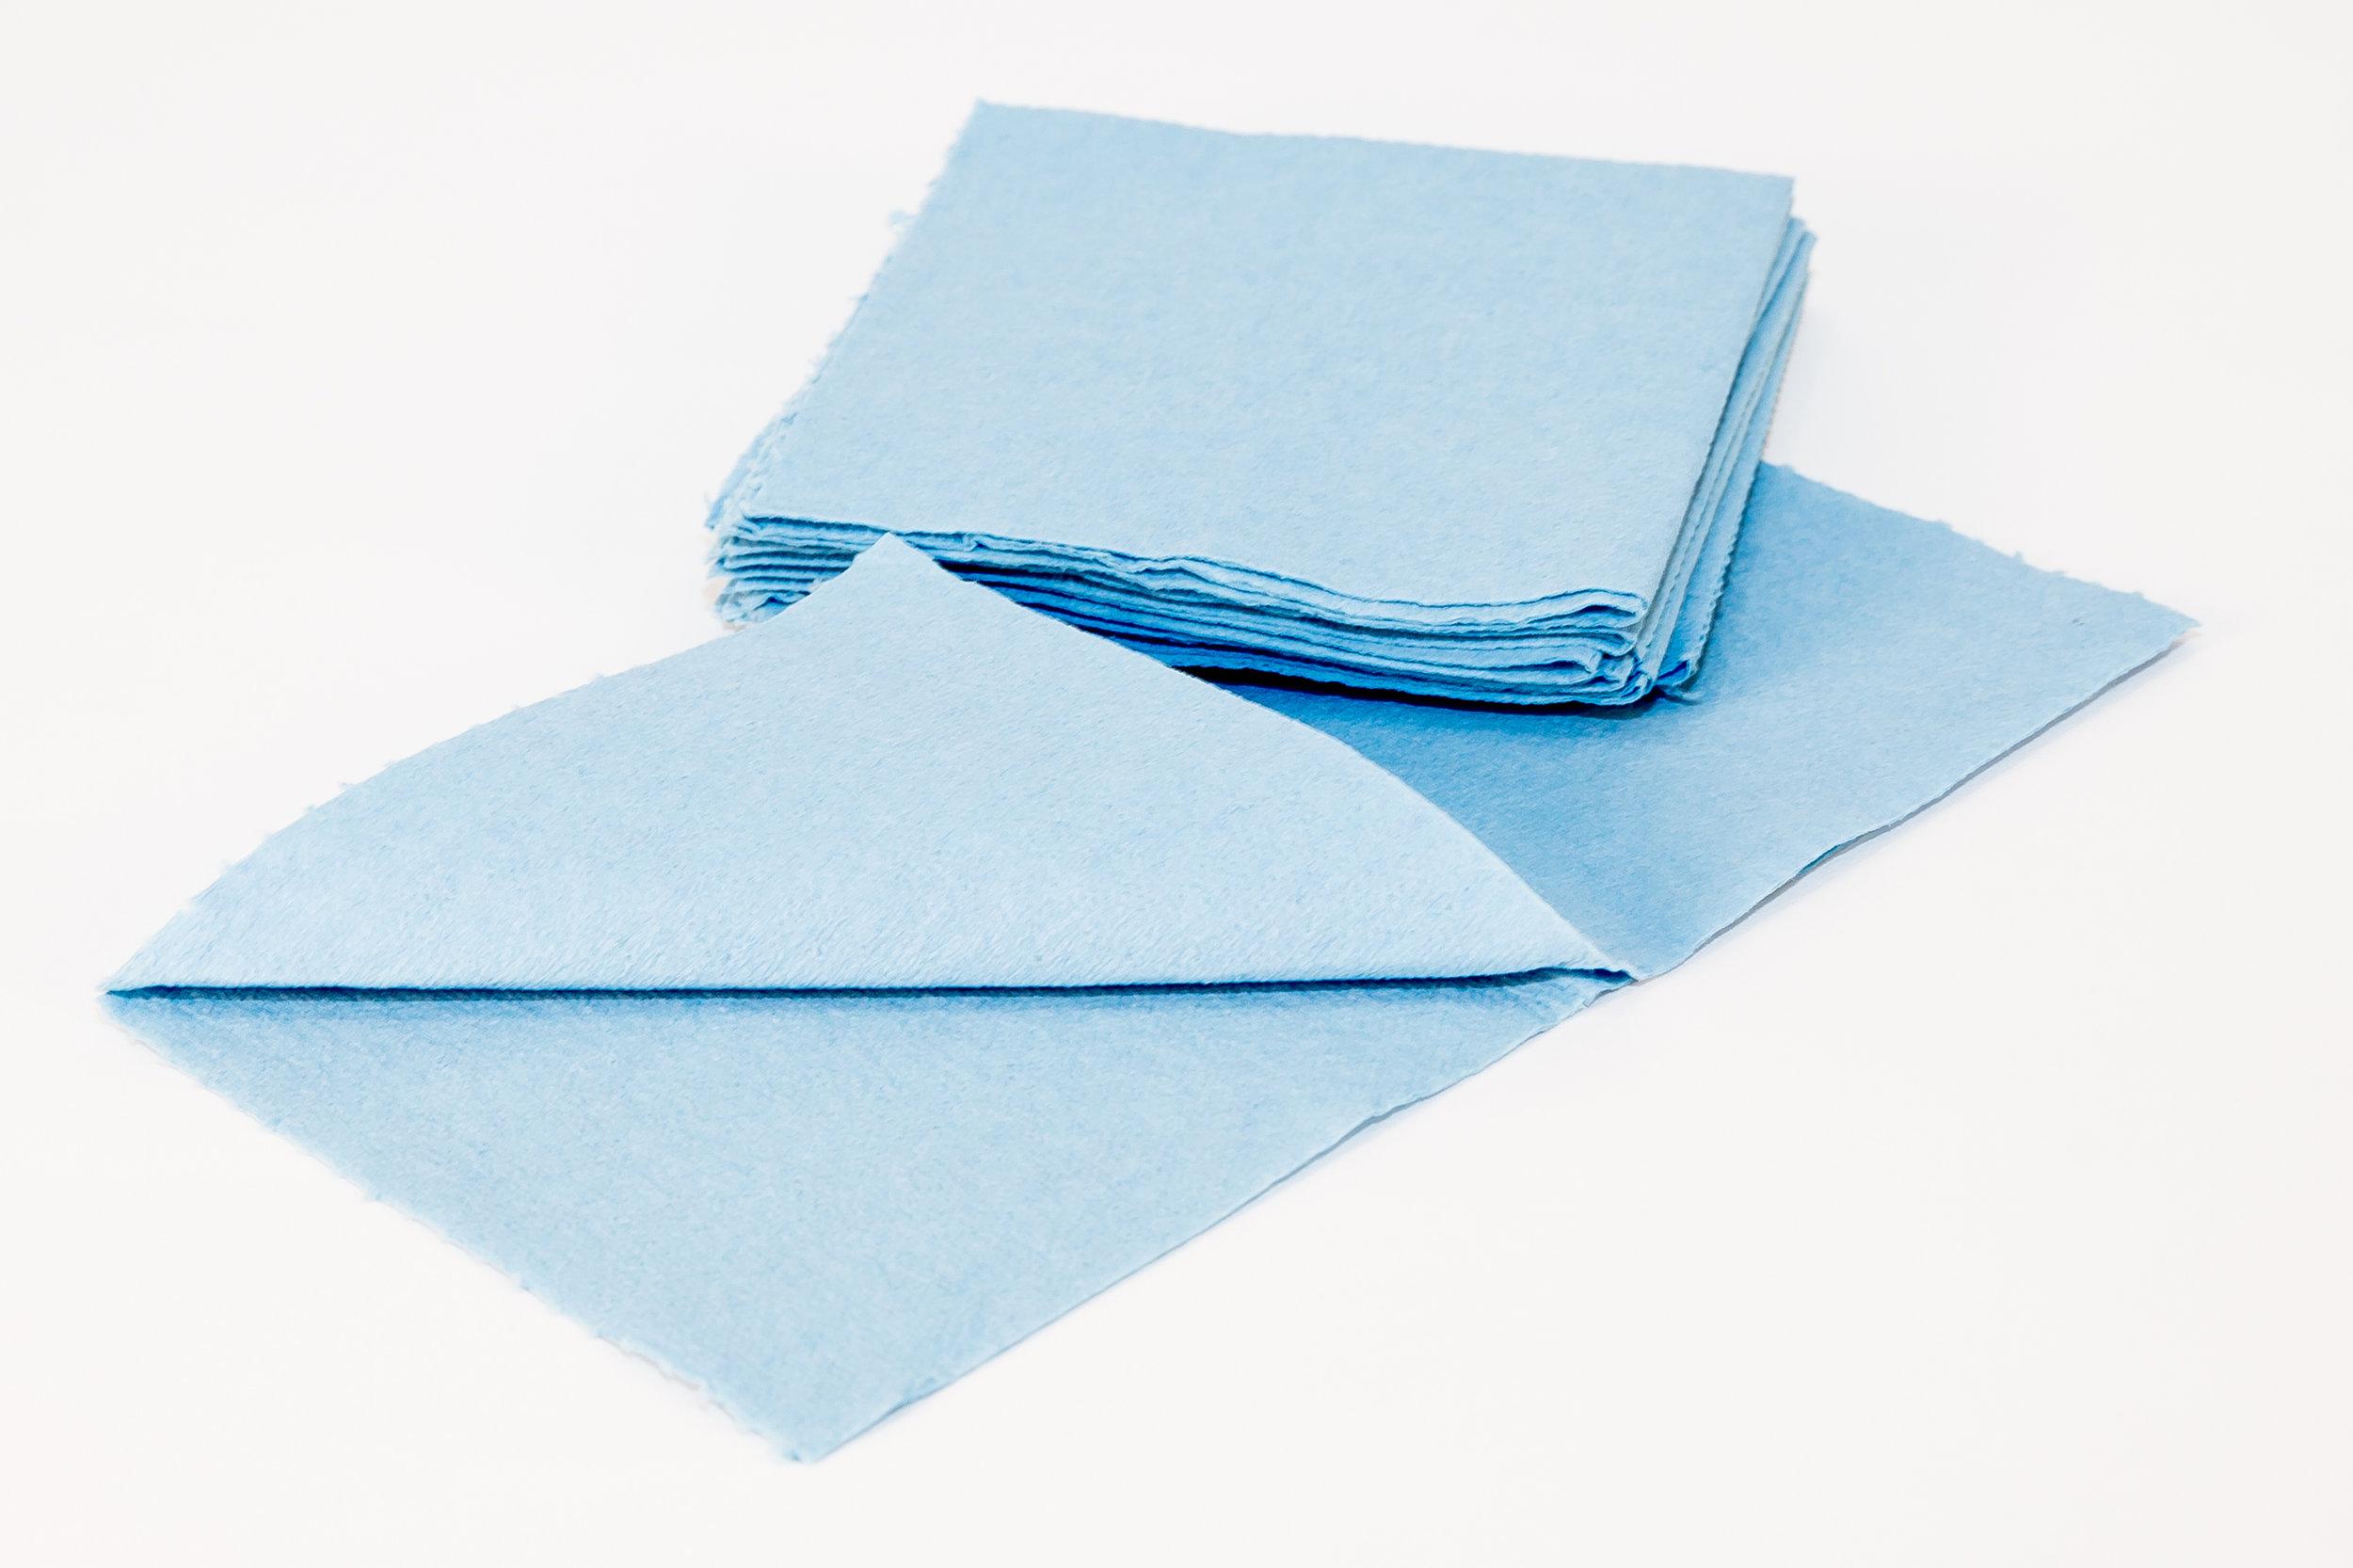 Gun Cleaning Paper Towels.jpg